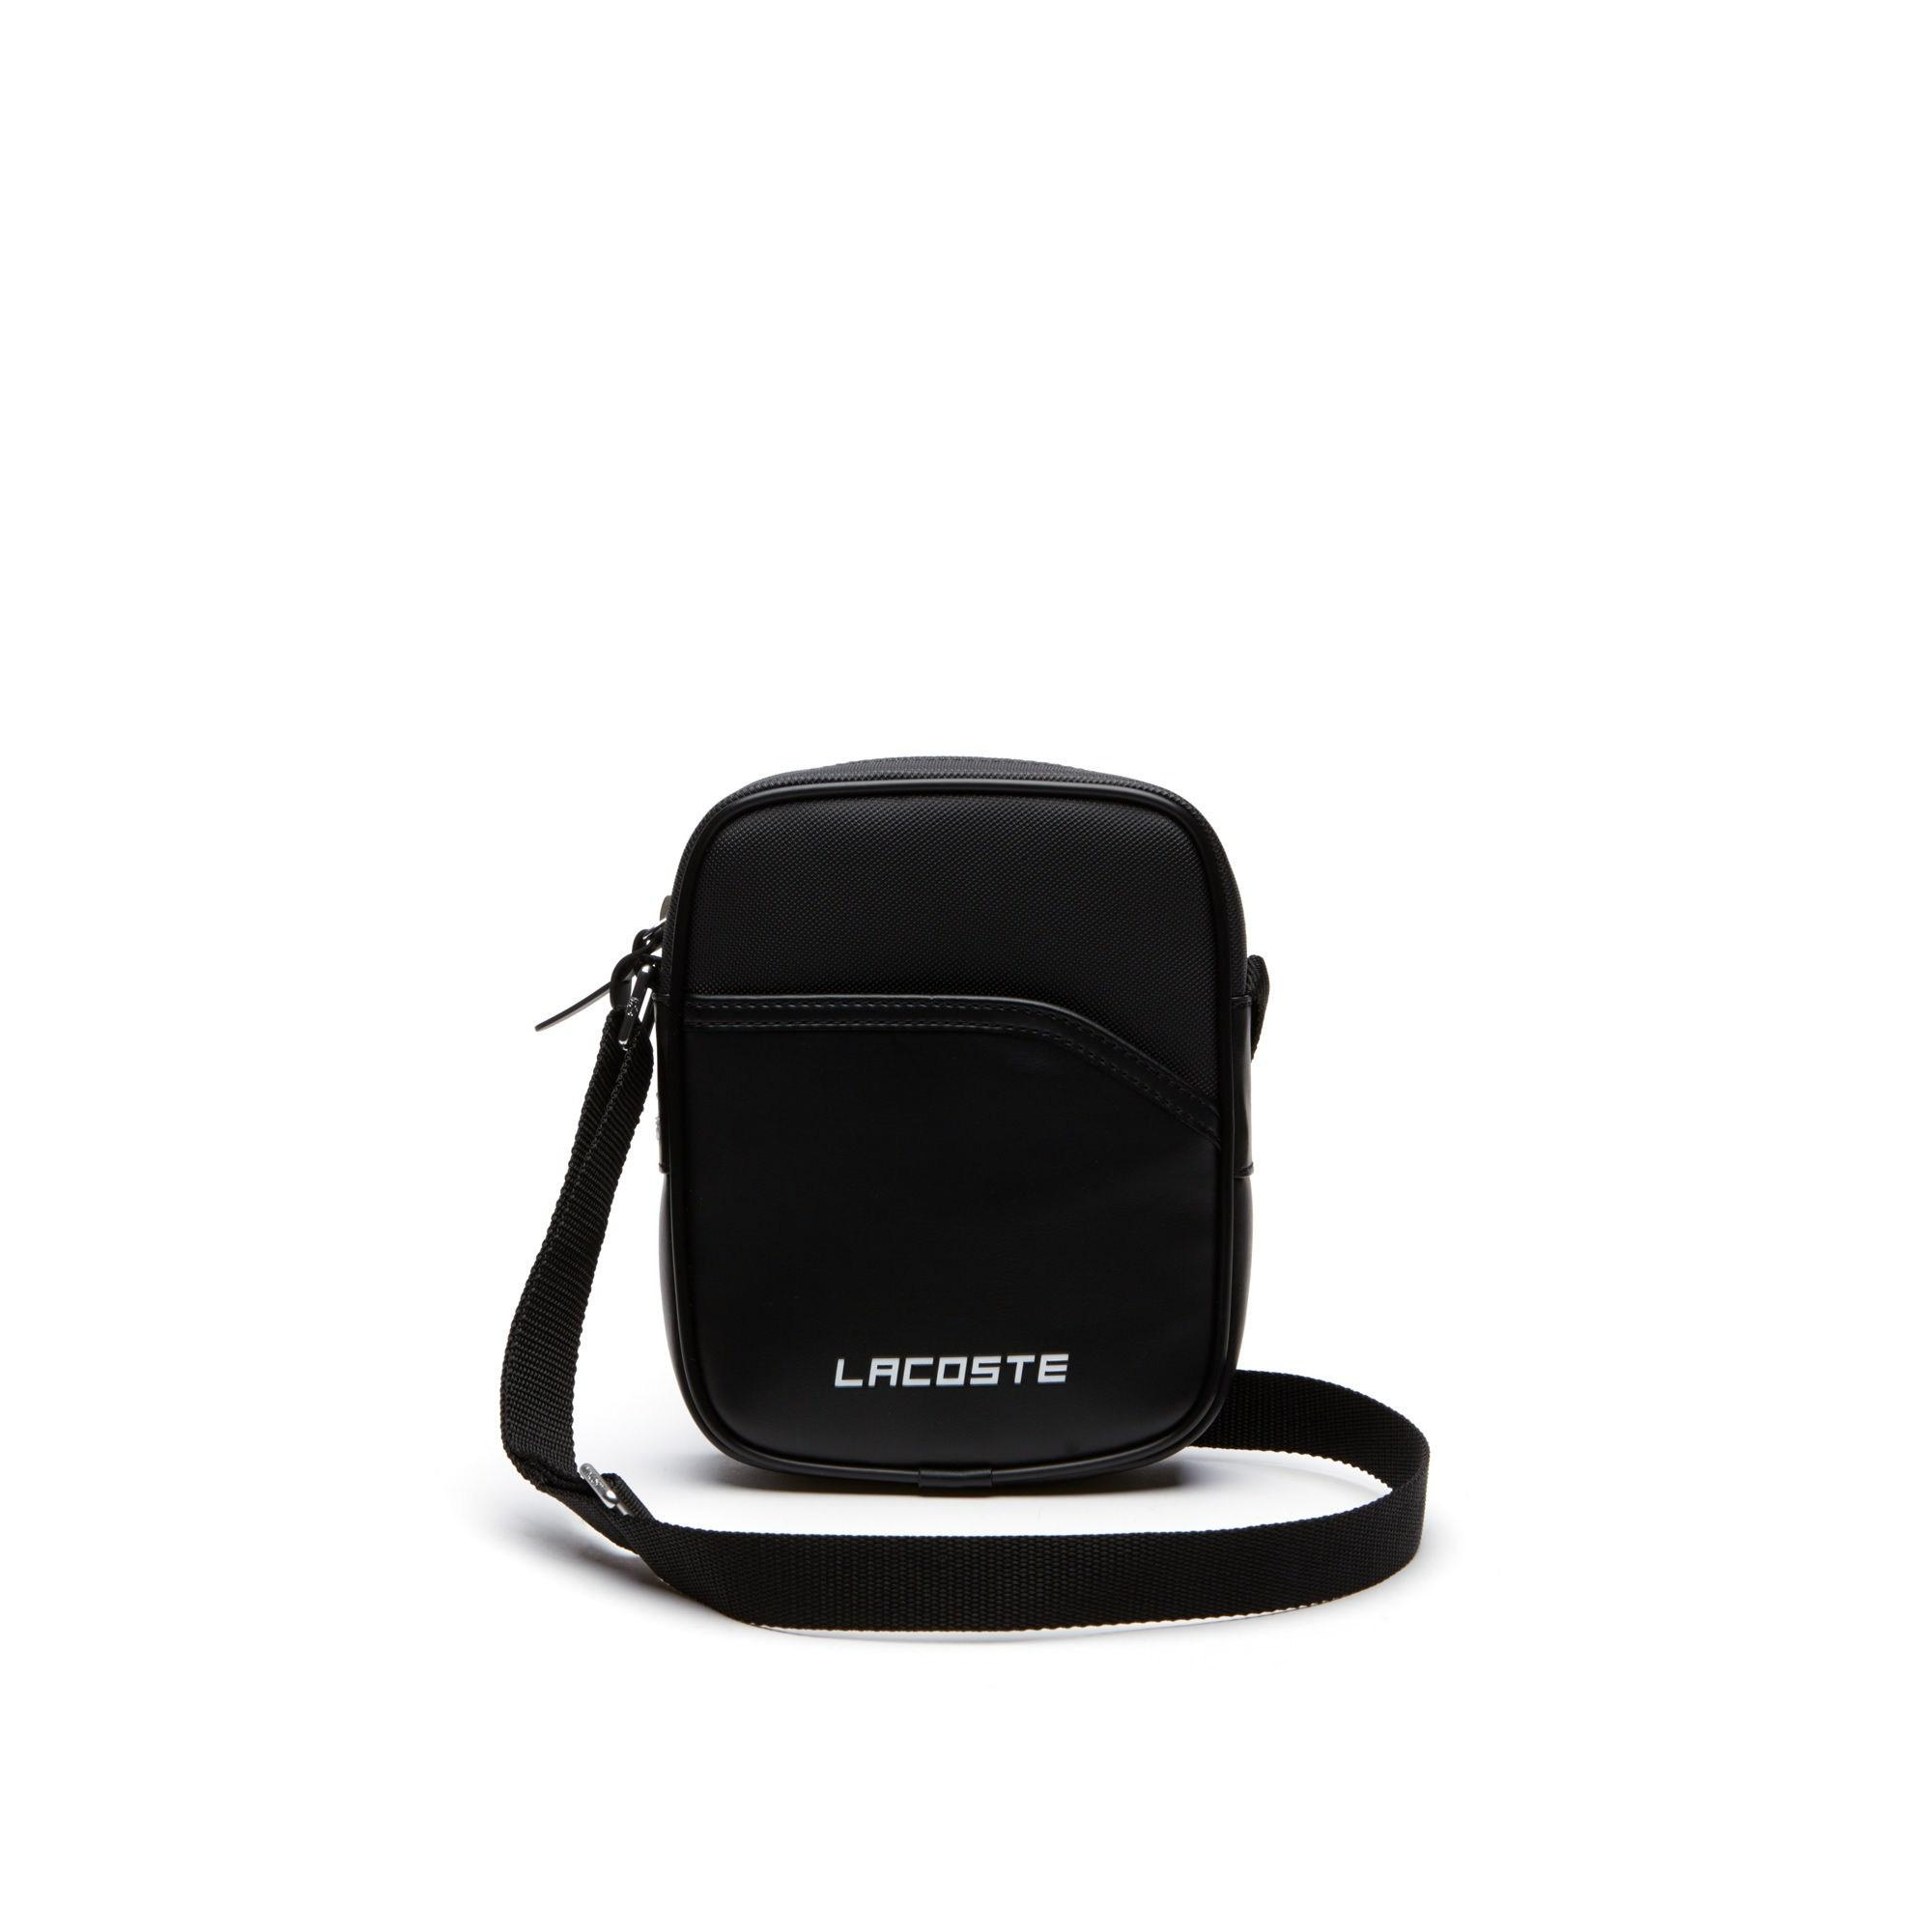 37d26387a0d4 Lacoste - Black Sport Vertical Canvas Bag for Men - Lyst. View fullscreen